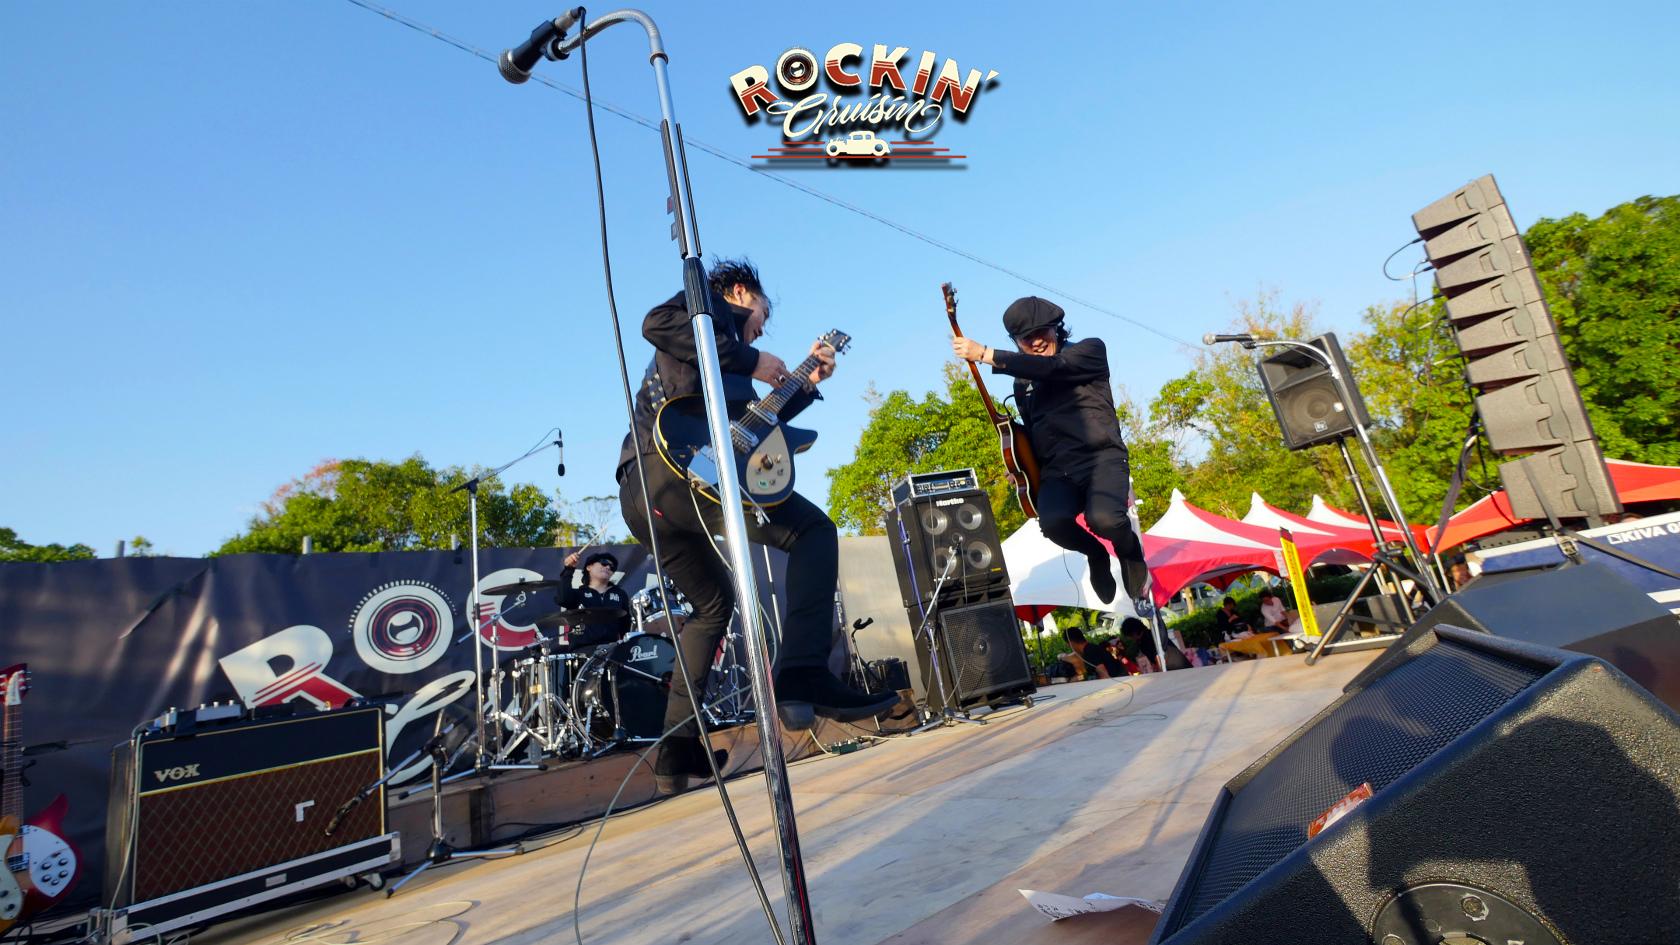 58-2-rockin11th_0757